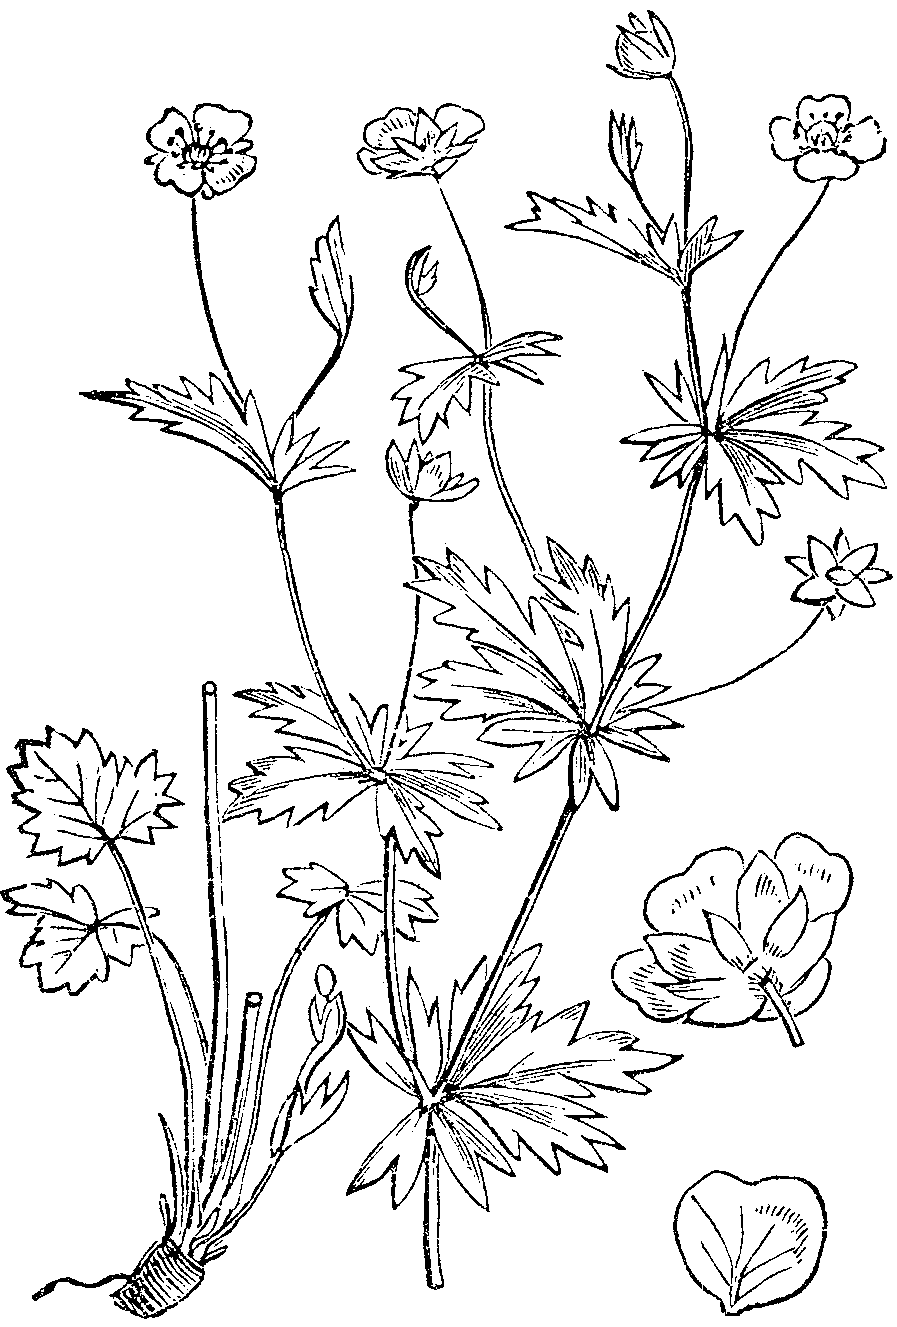 Abbildung aus Naše škodljive rastline (1892); Blutwurz, Birkwurz, Tormentill, Mooreckel, Ruhrwurz and Rotwurz